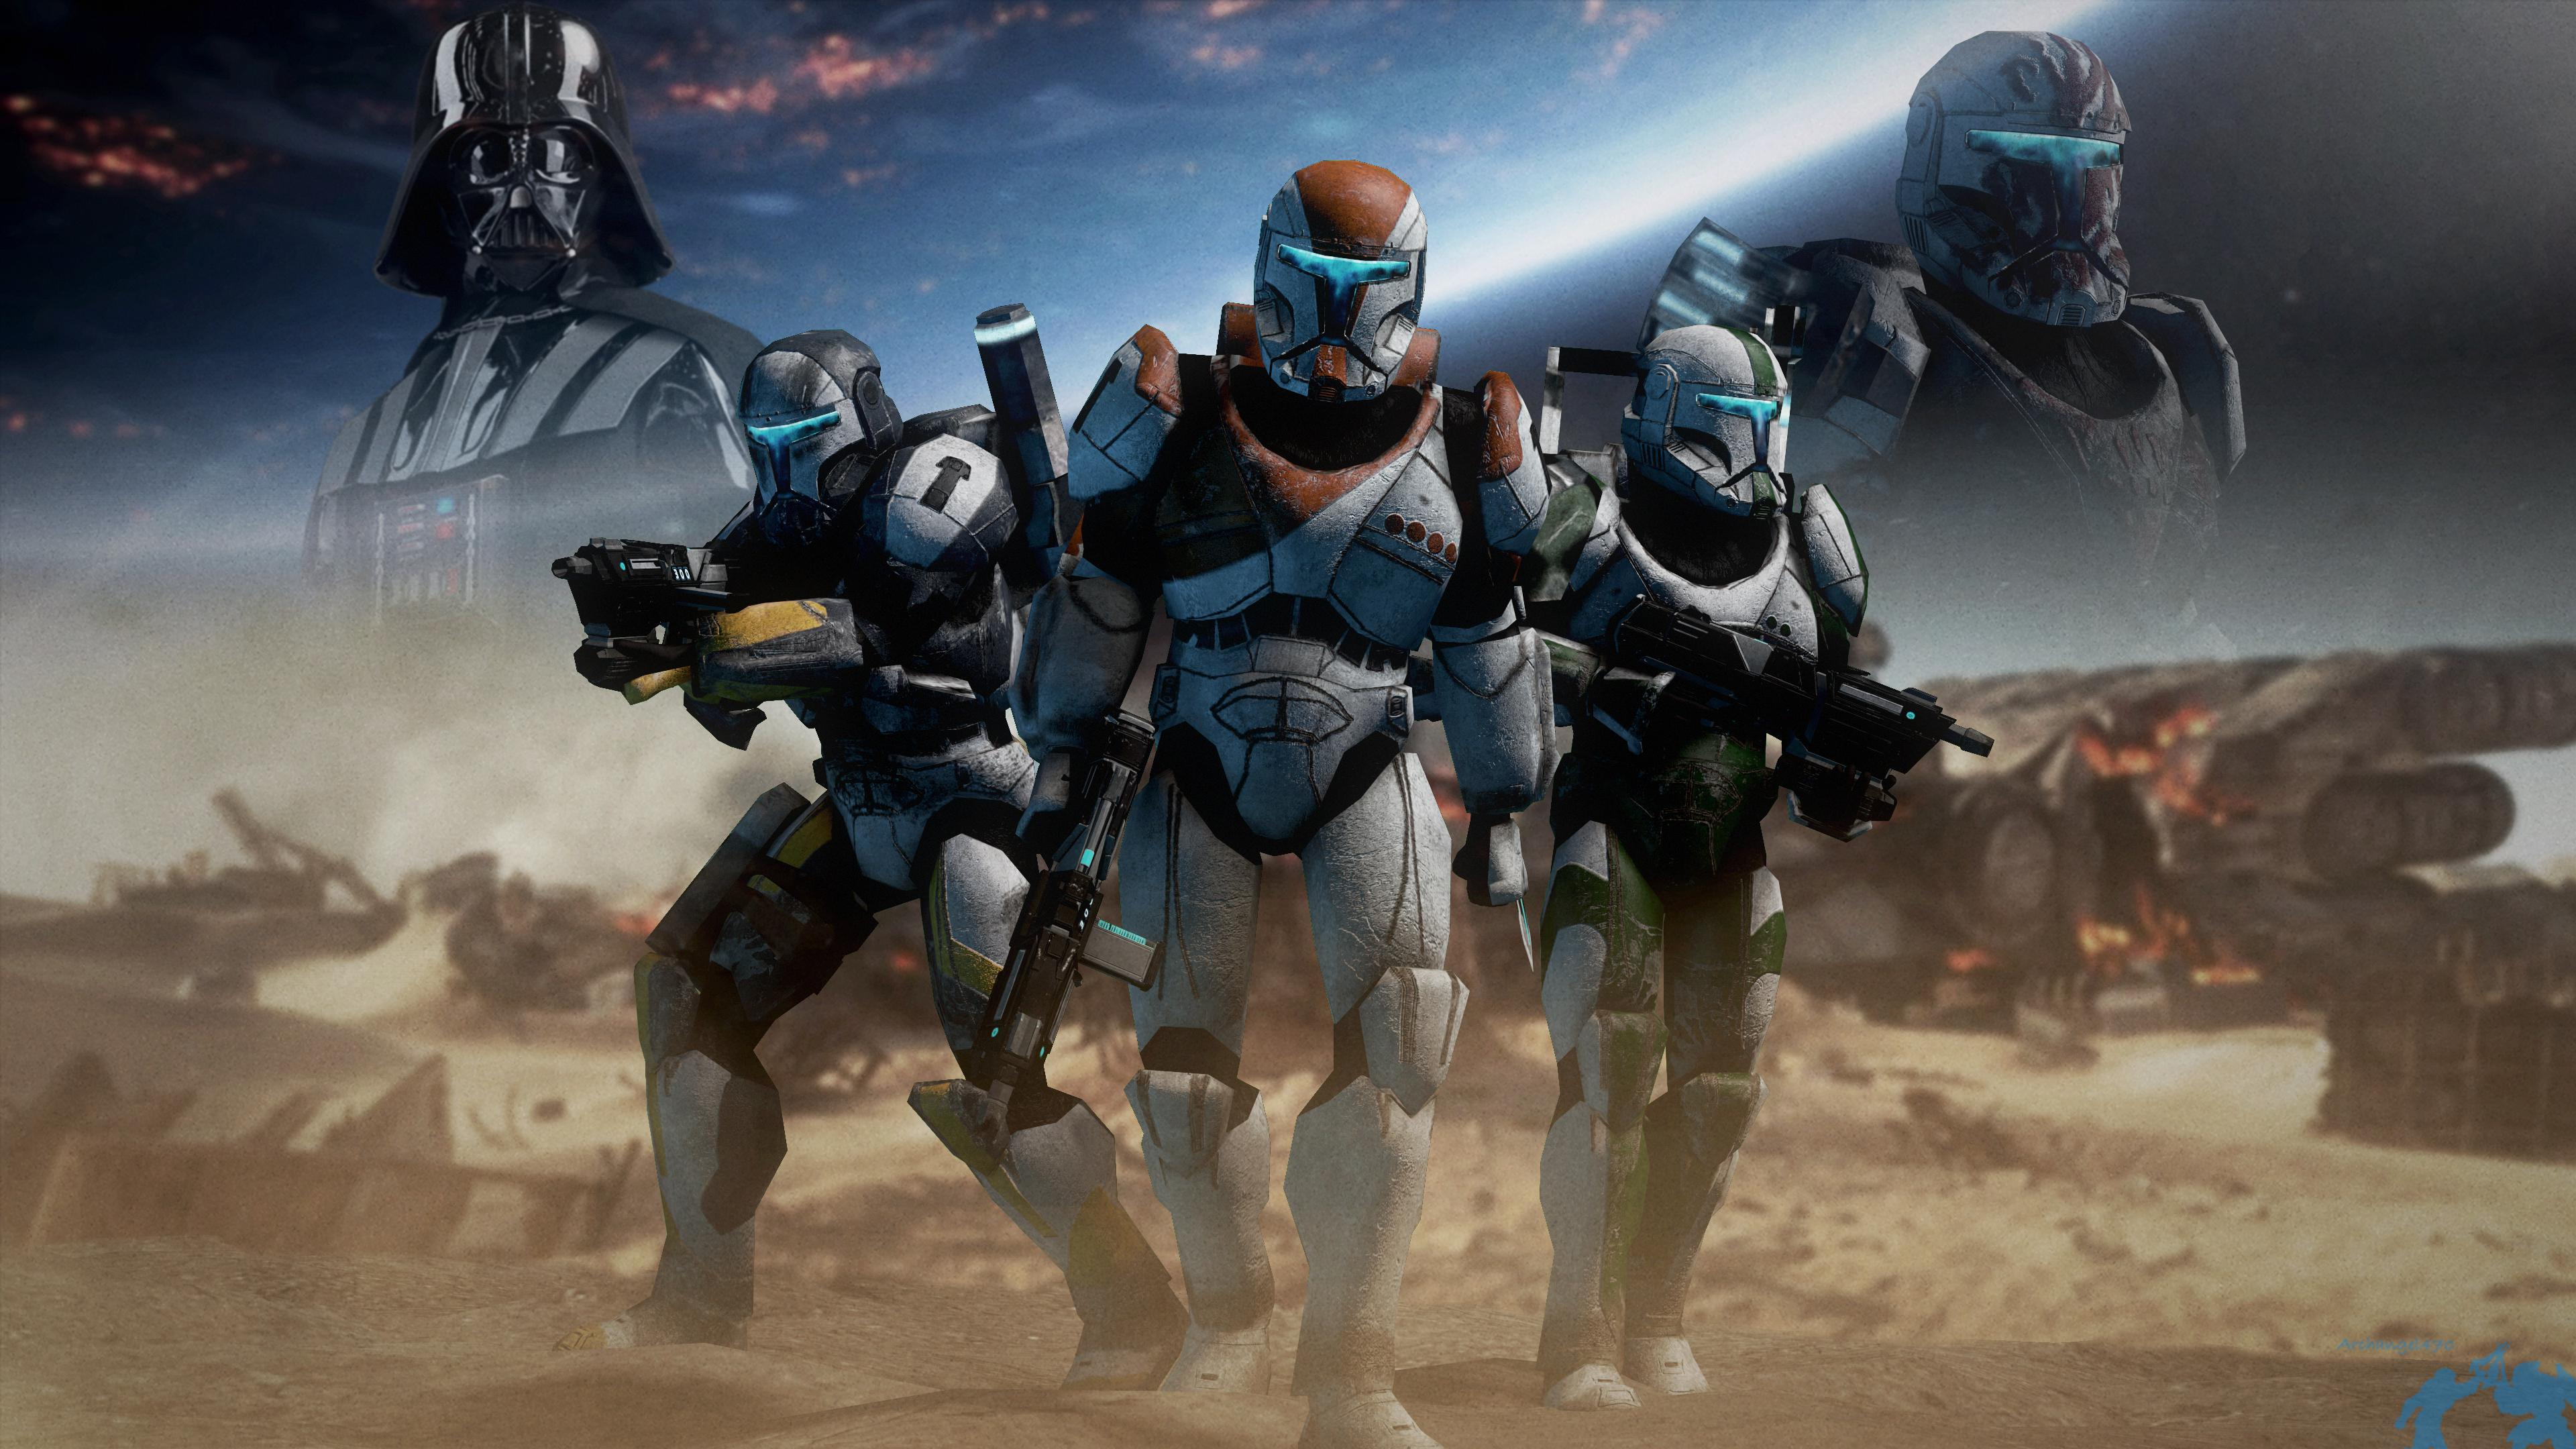 Star Wars Republic Commando Wallpaper Posted By Zoey Peltier